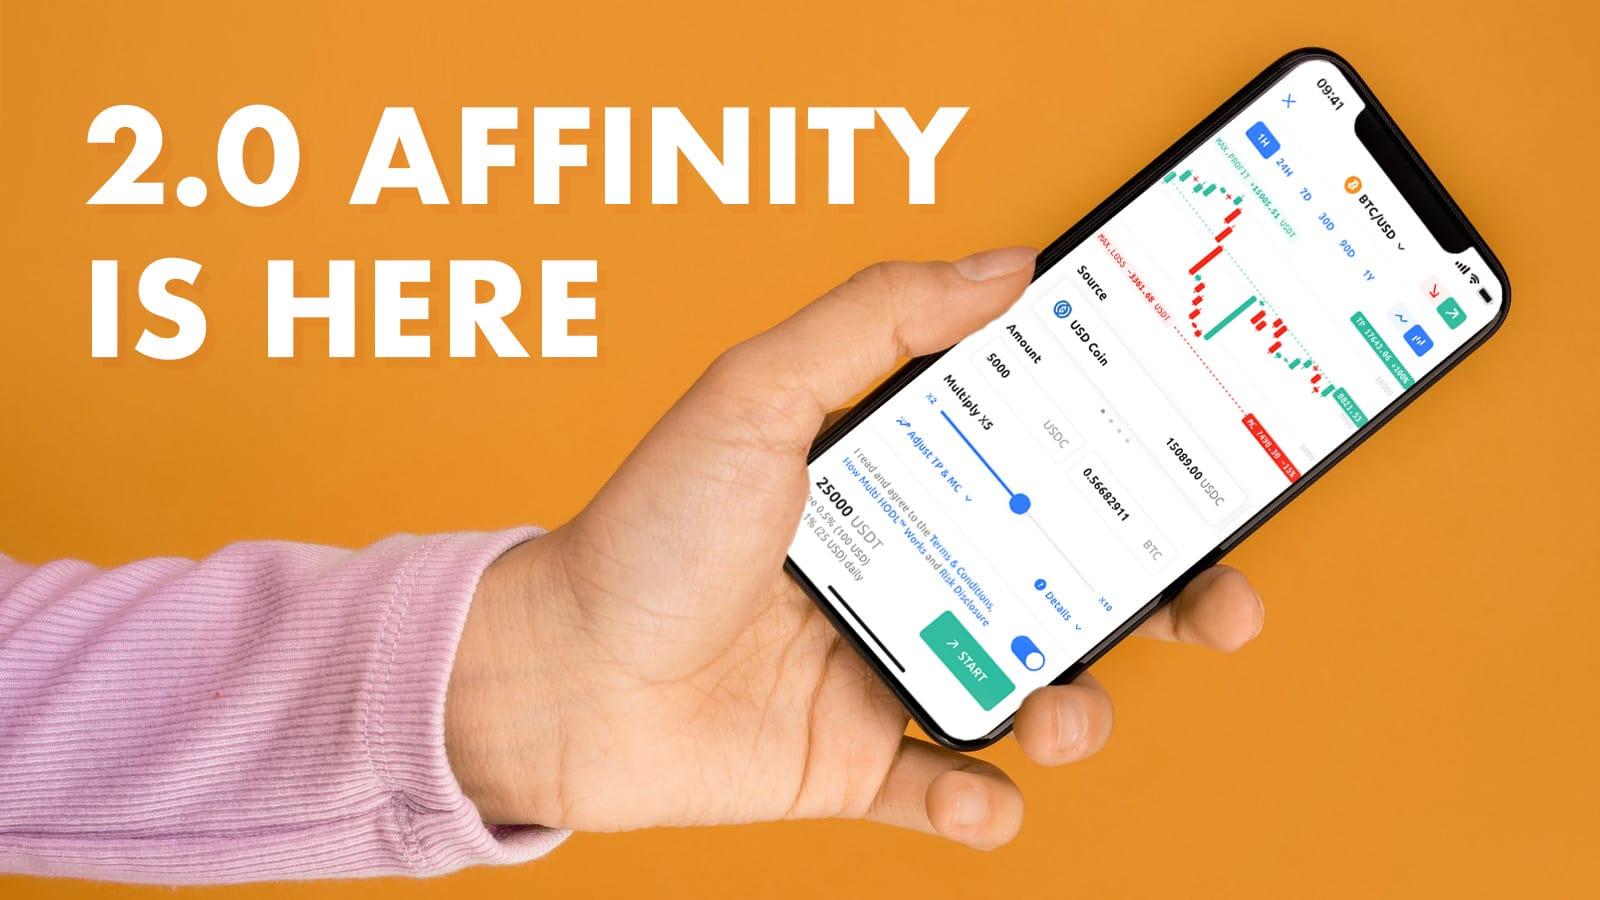 affinity, ethereum, bitcoin, BTC, ETH, crypto, crypto loans, cryptocurrency lending, DeFi, Fintech